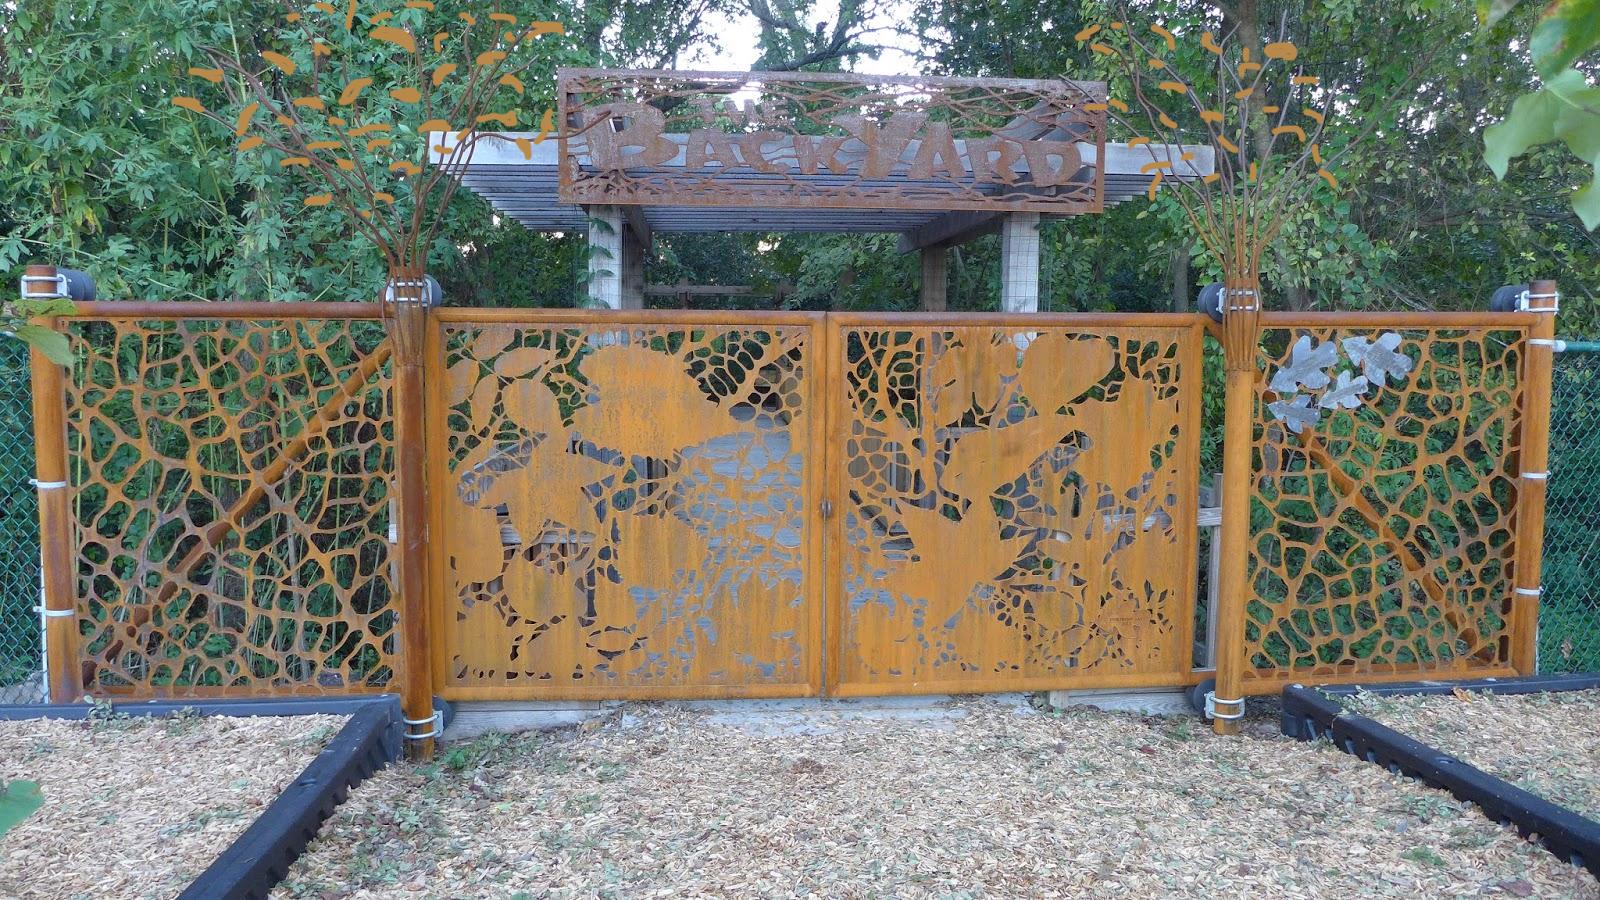 SCHLENKER SCHOOL GATE